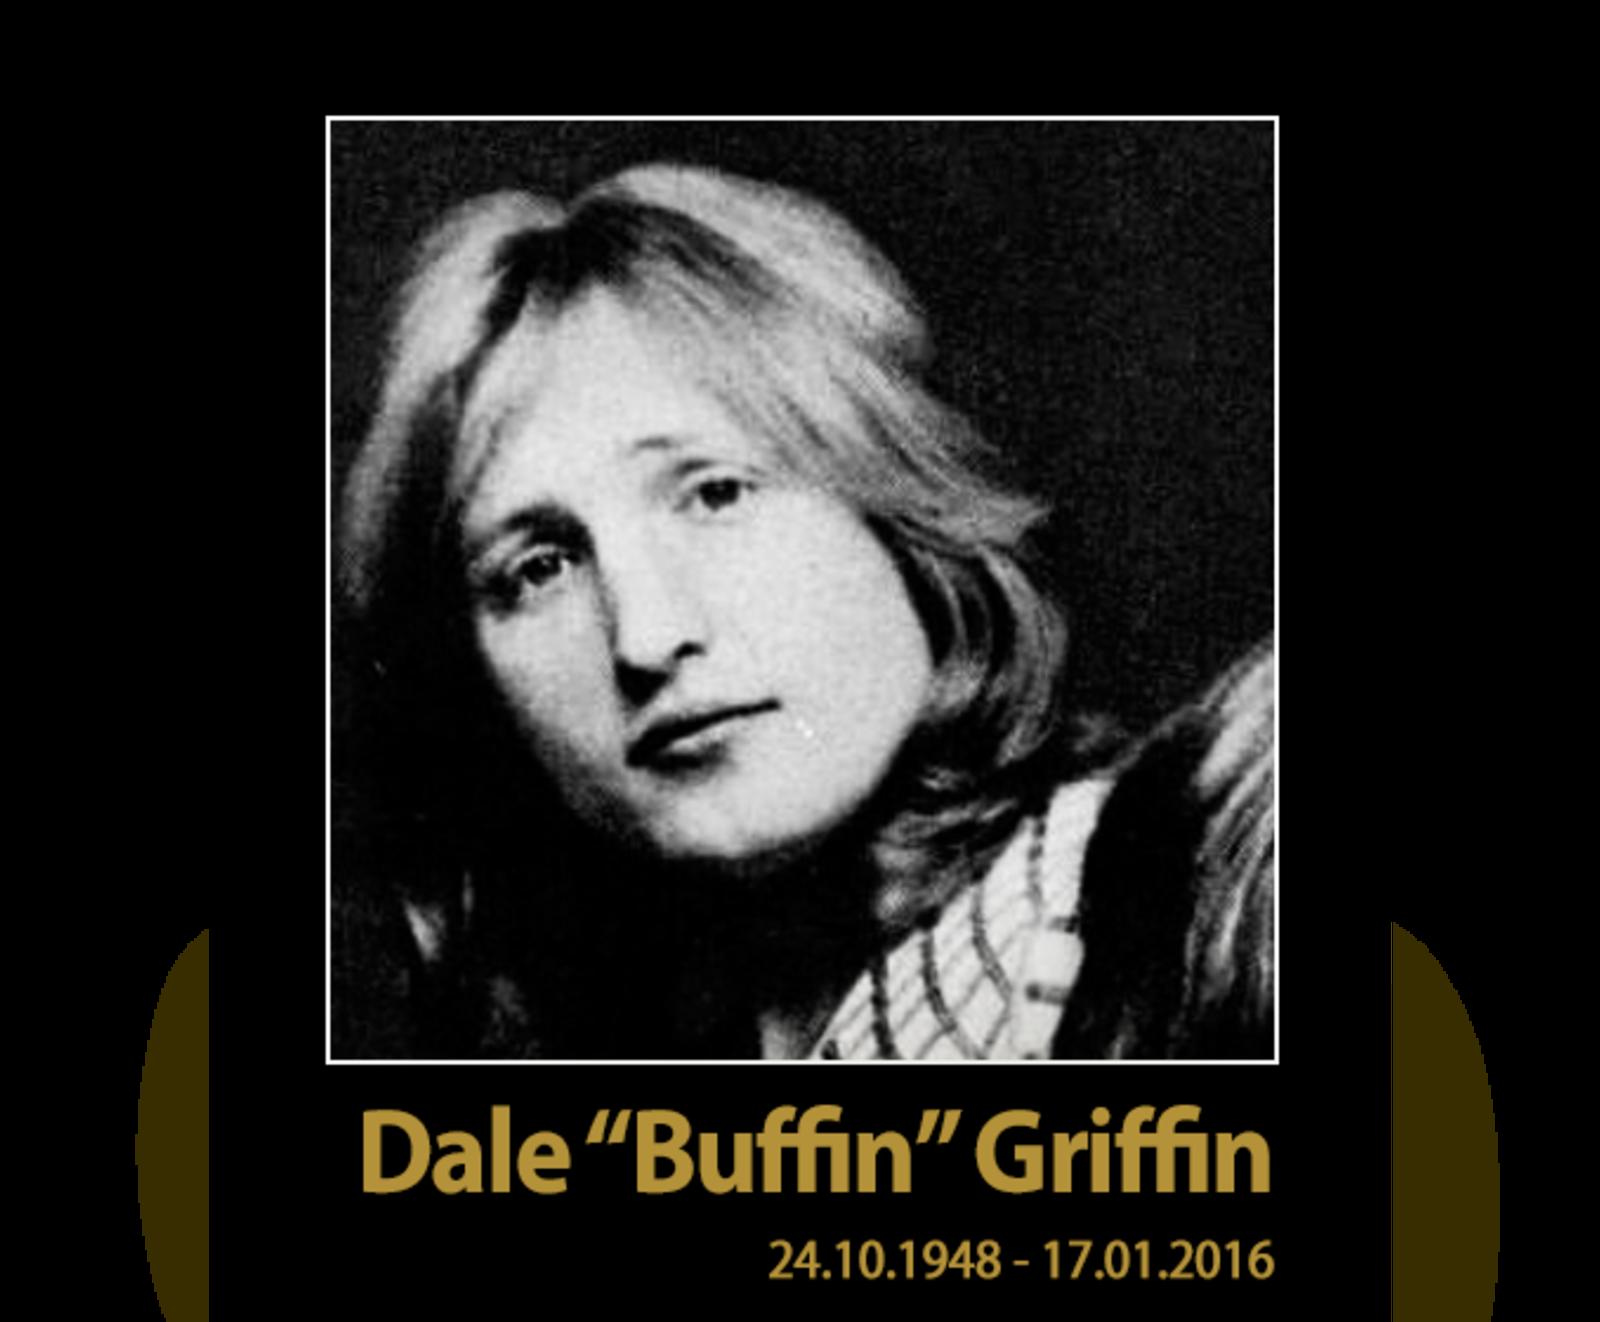 Dale Griffin